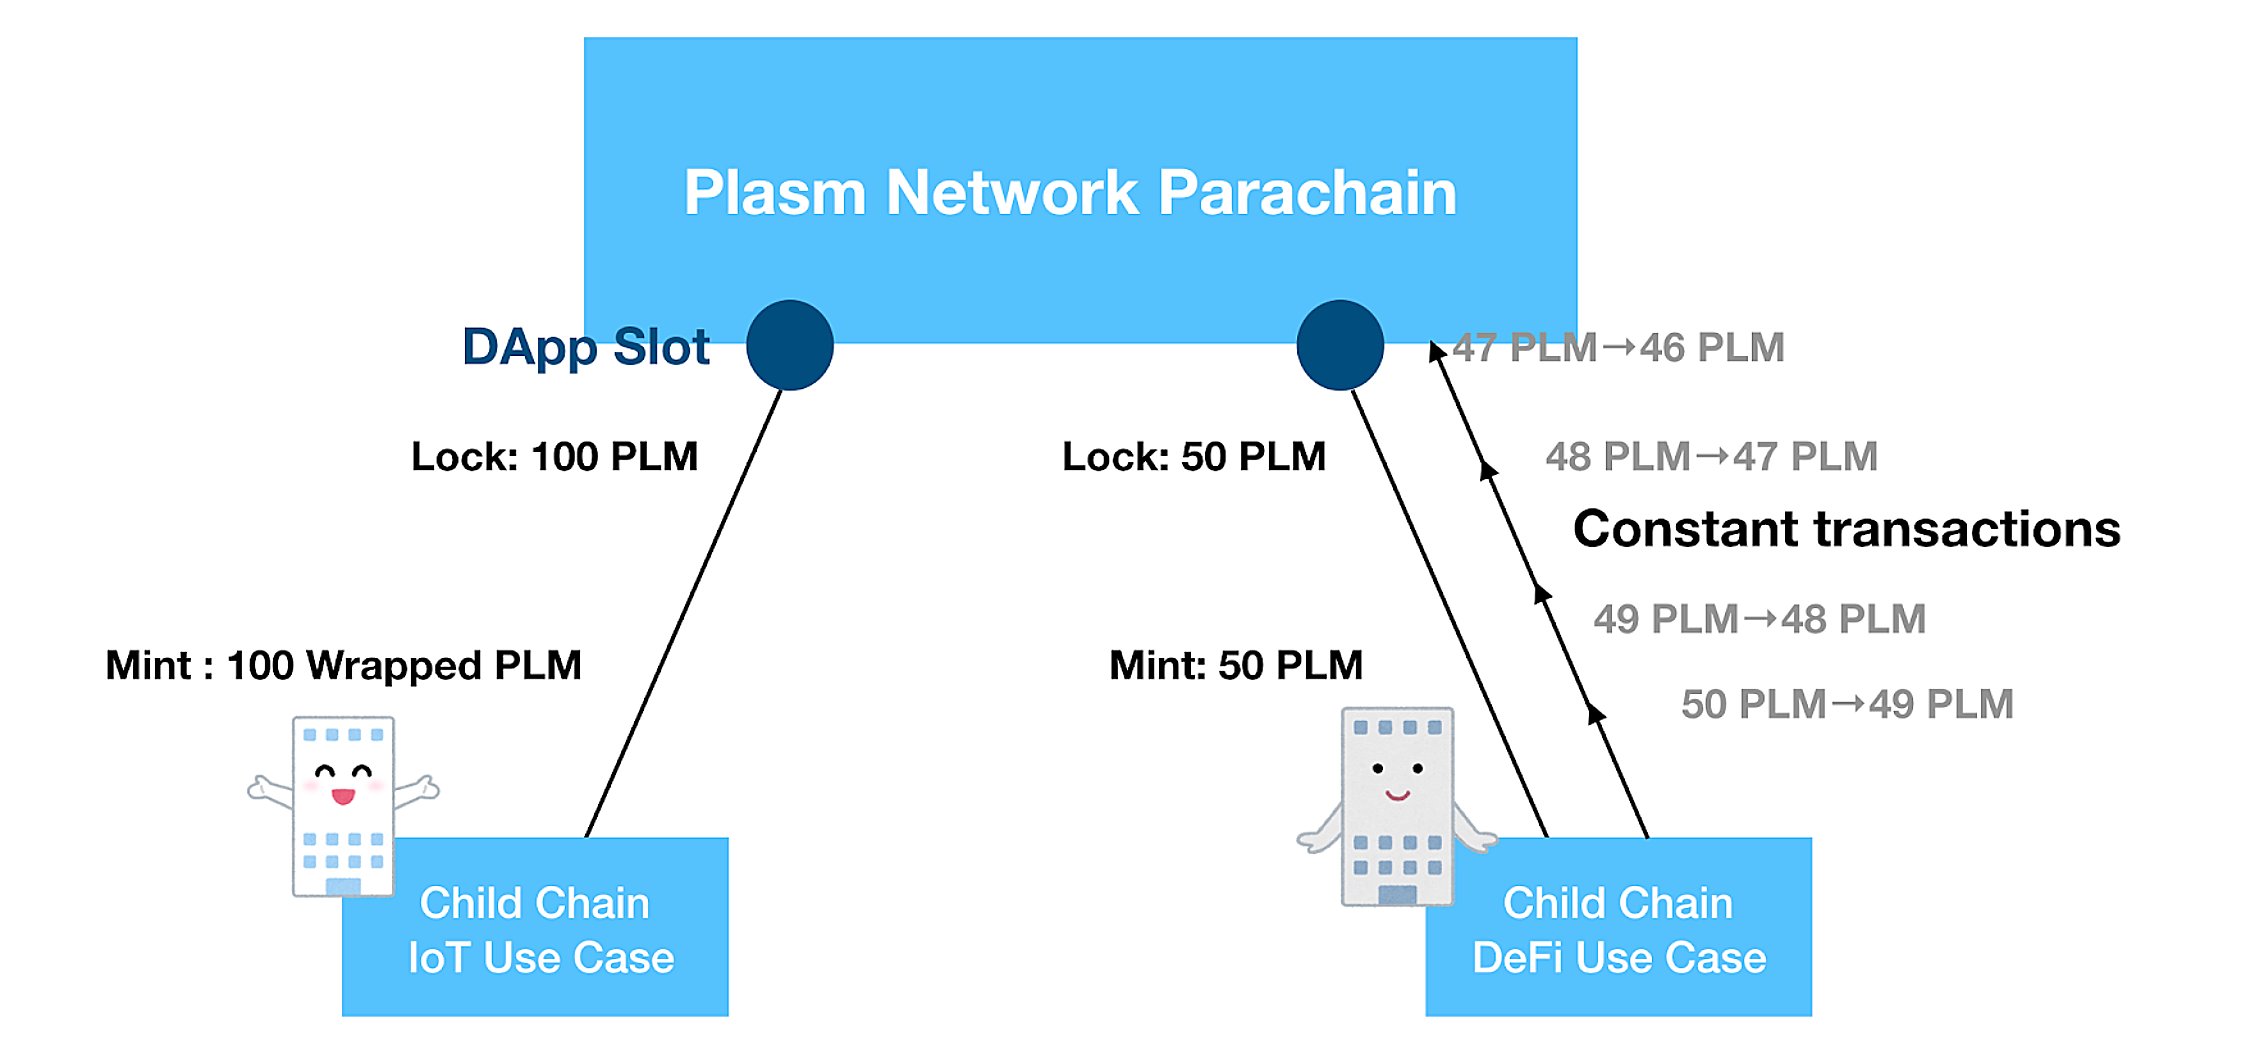 dApps Slot PLM Plasm Network